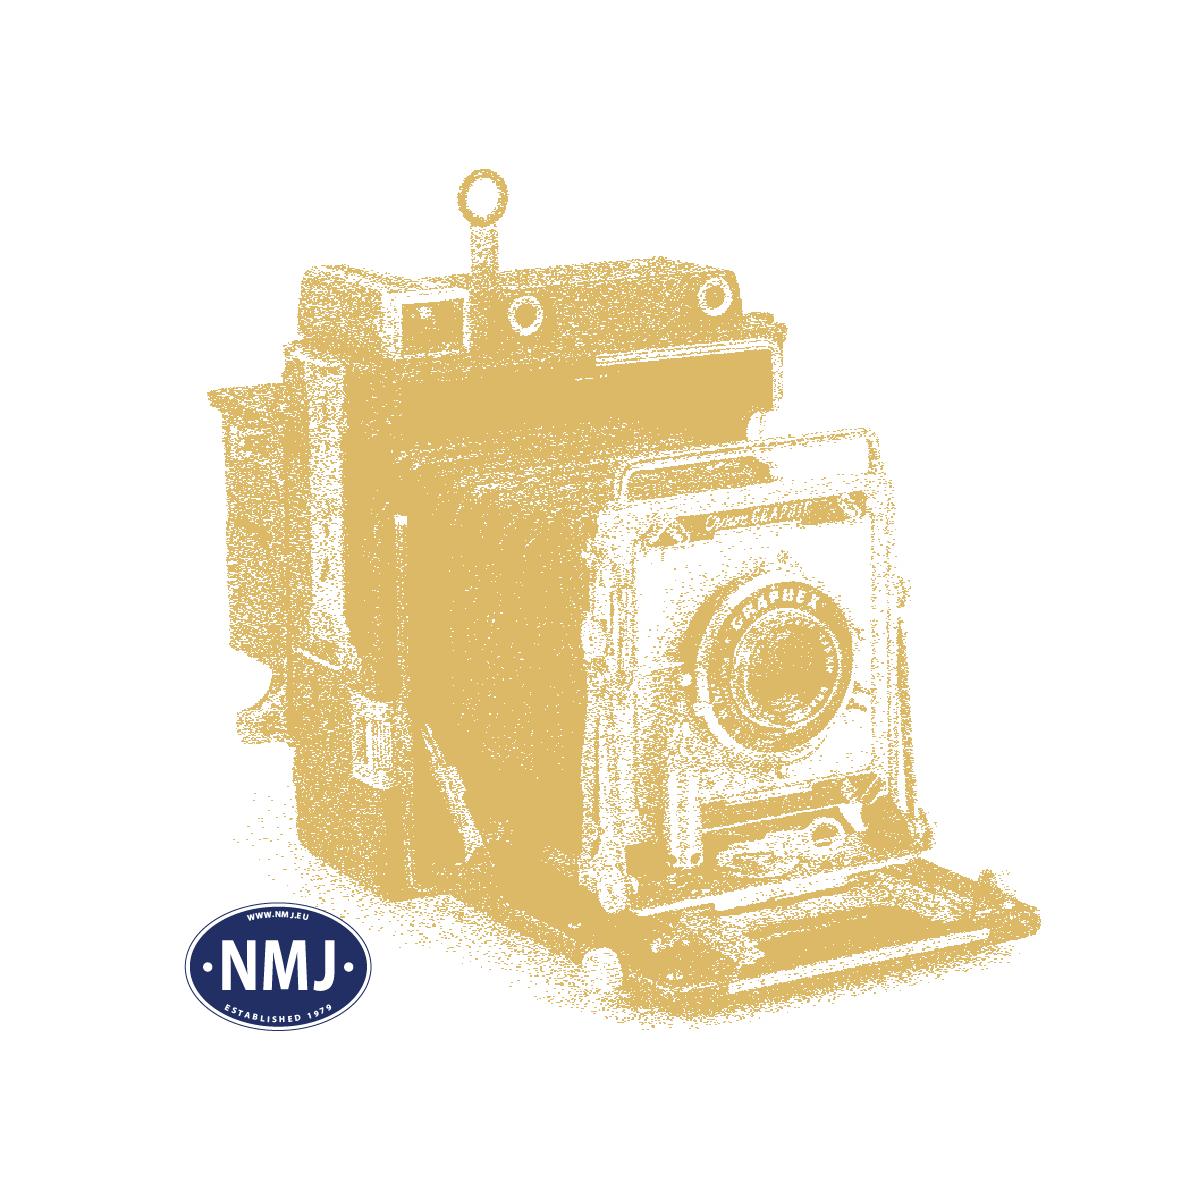 NMJT84.103AC - NMJ Topline NSB BM69A.014, AC Digital